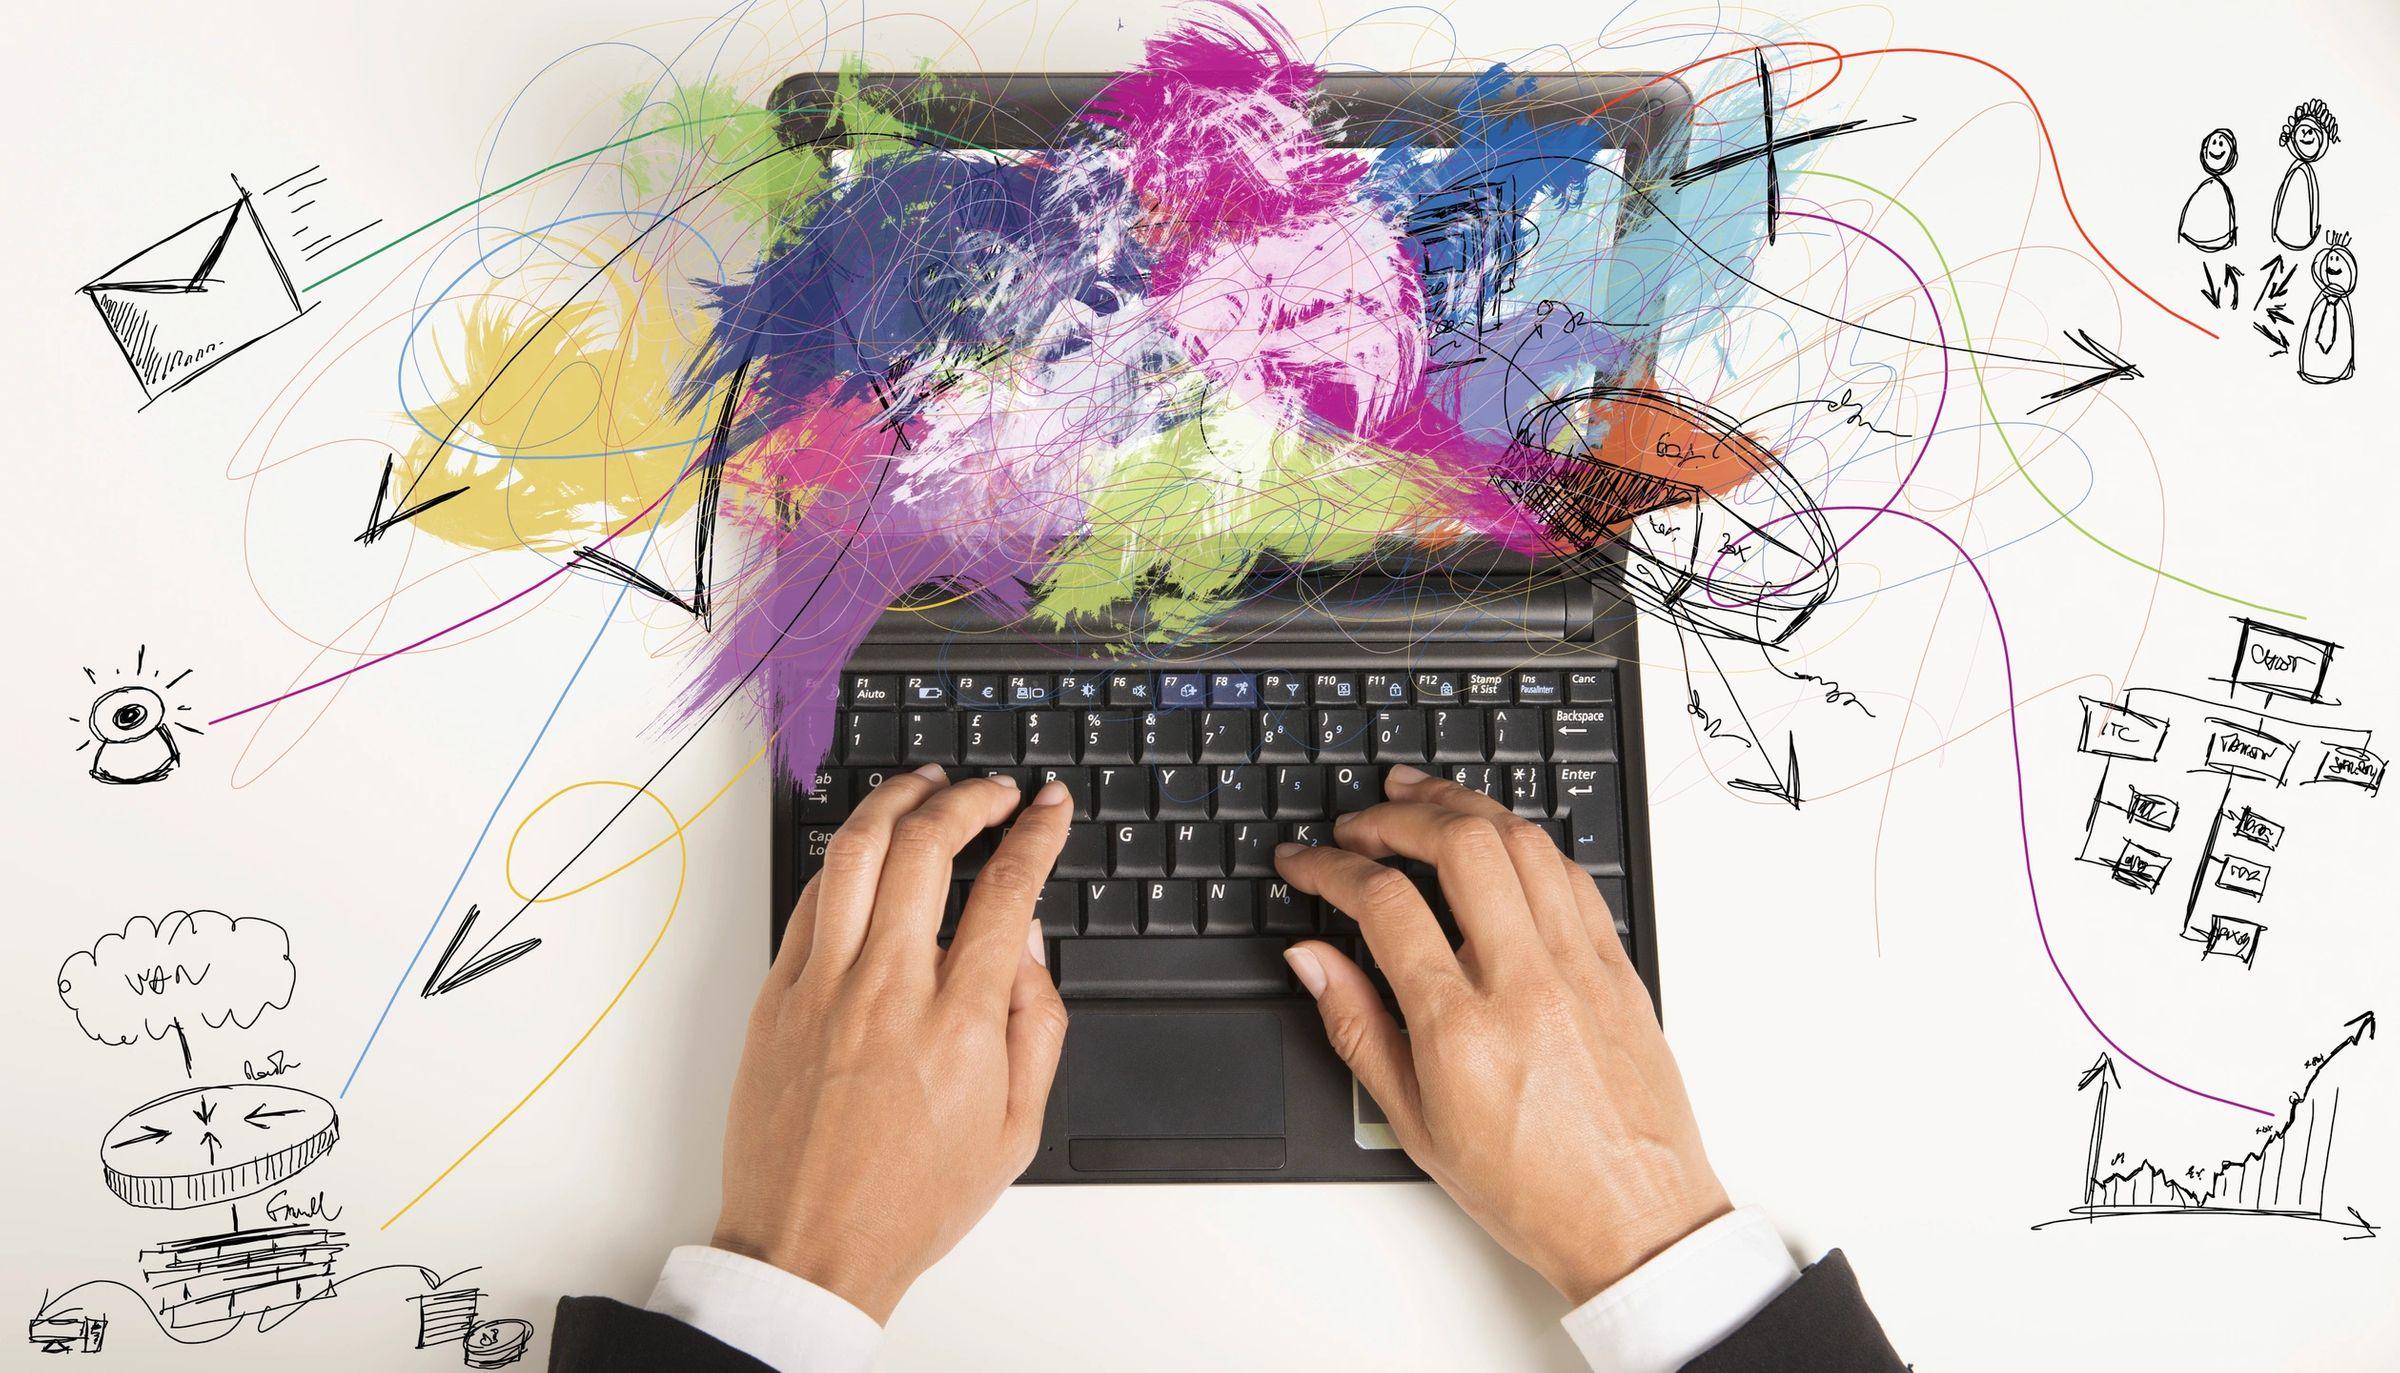 business tools for digital entrepreneurship for professional service business